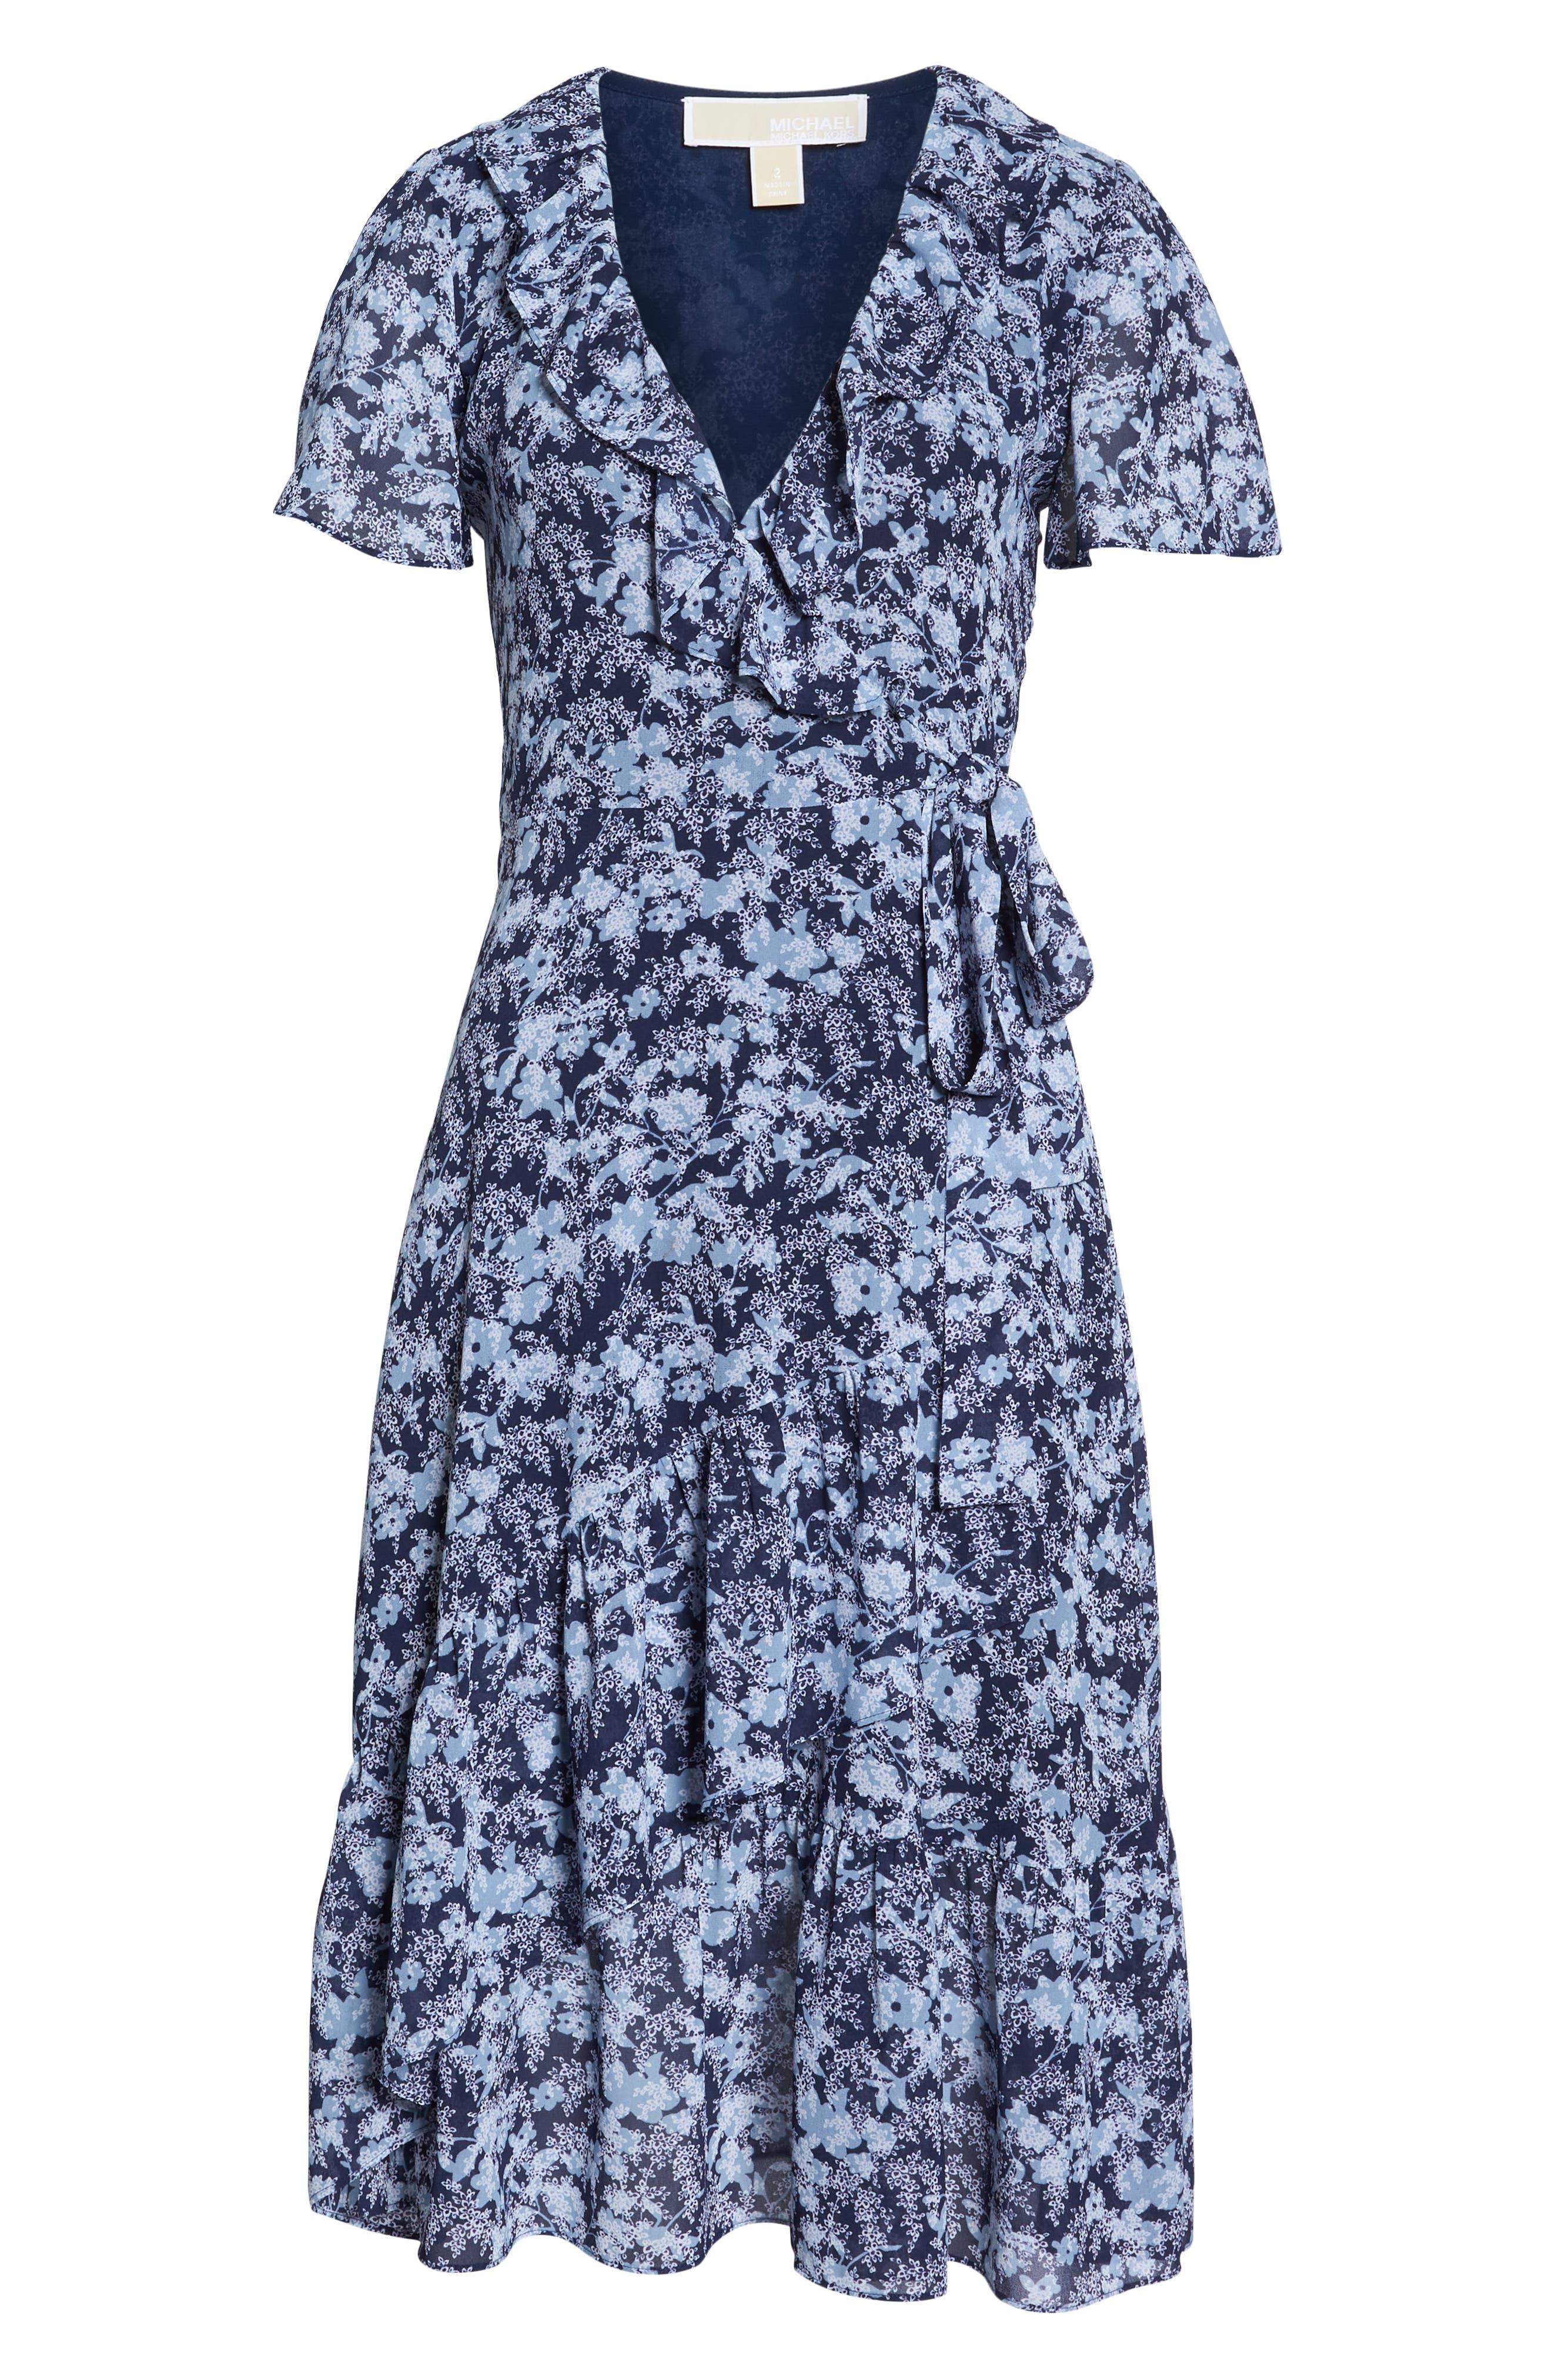 MICHAEL MICHAEL KORS, Ruffle Wrap Dress, Alternate thumbnail 7, color, TRUE NAVY/CHAMBRAY